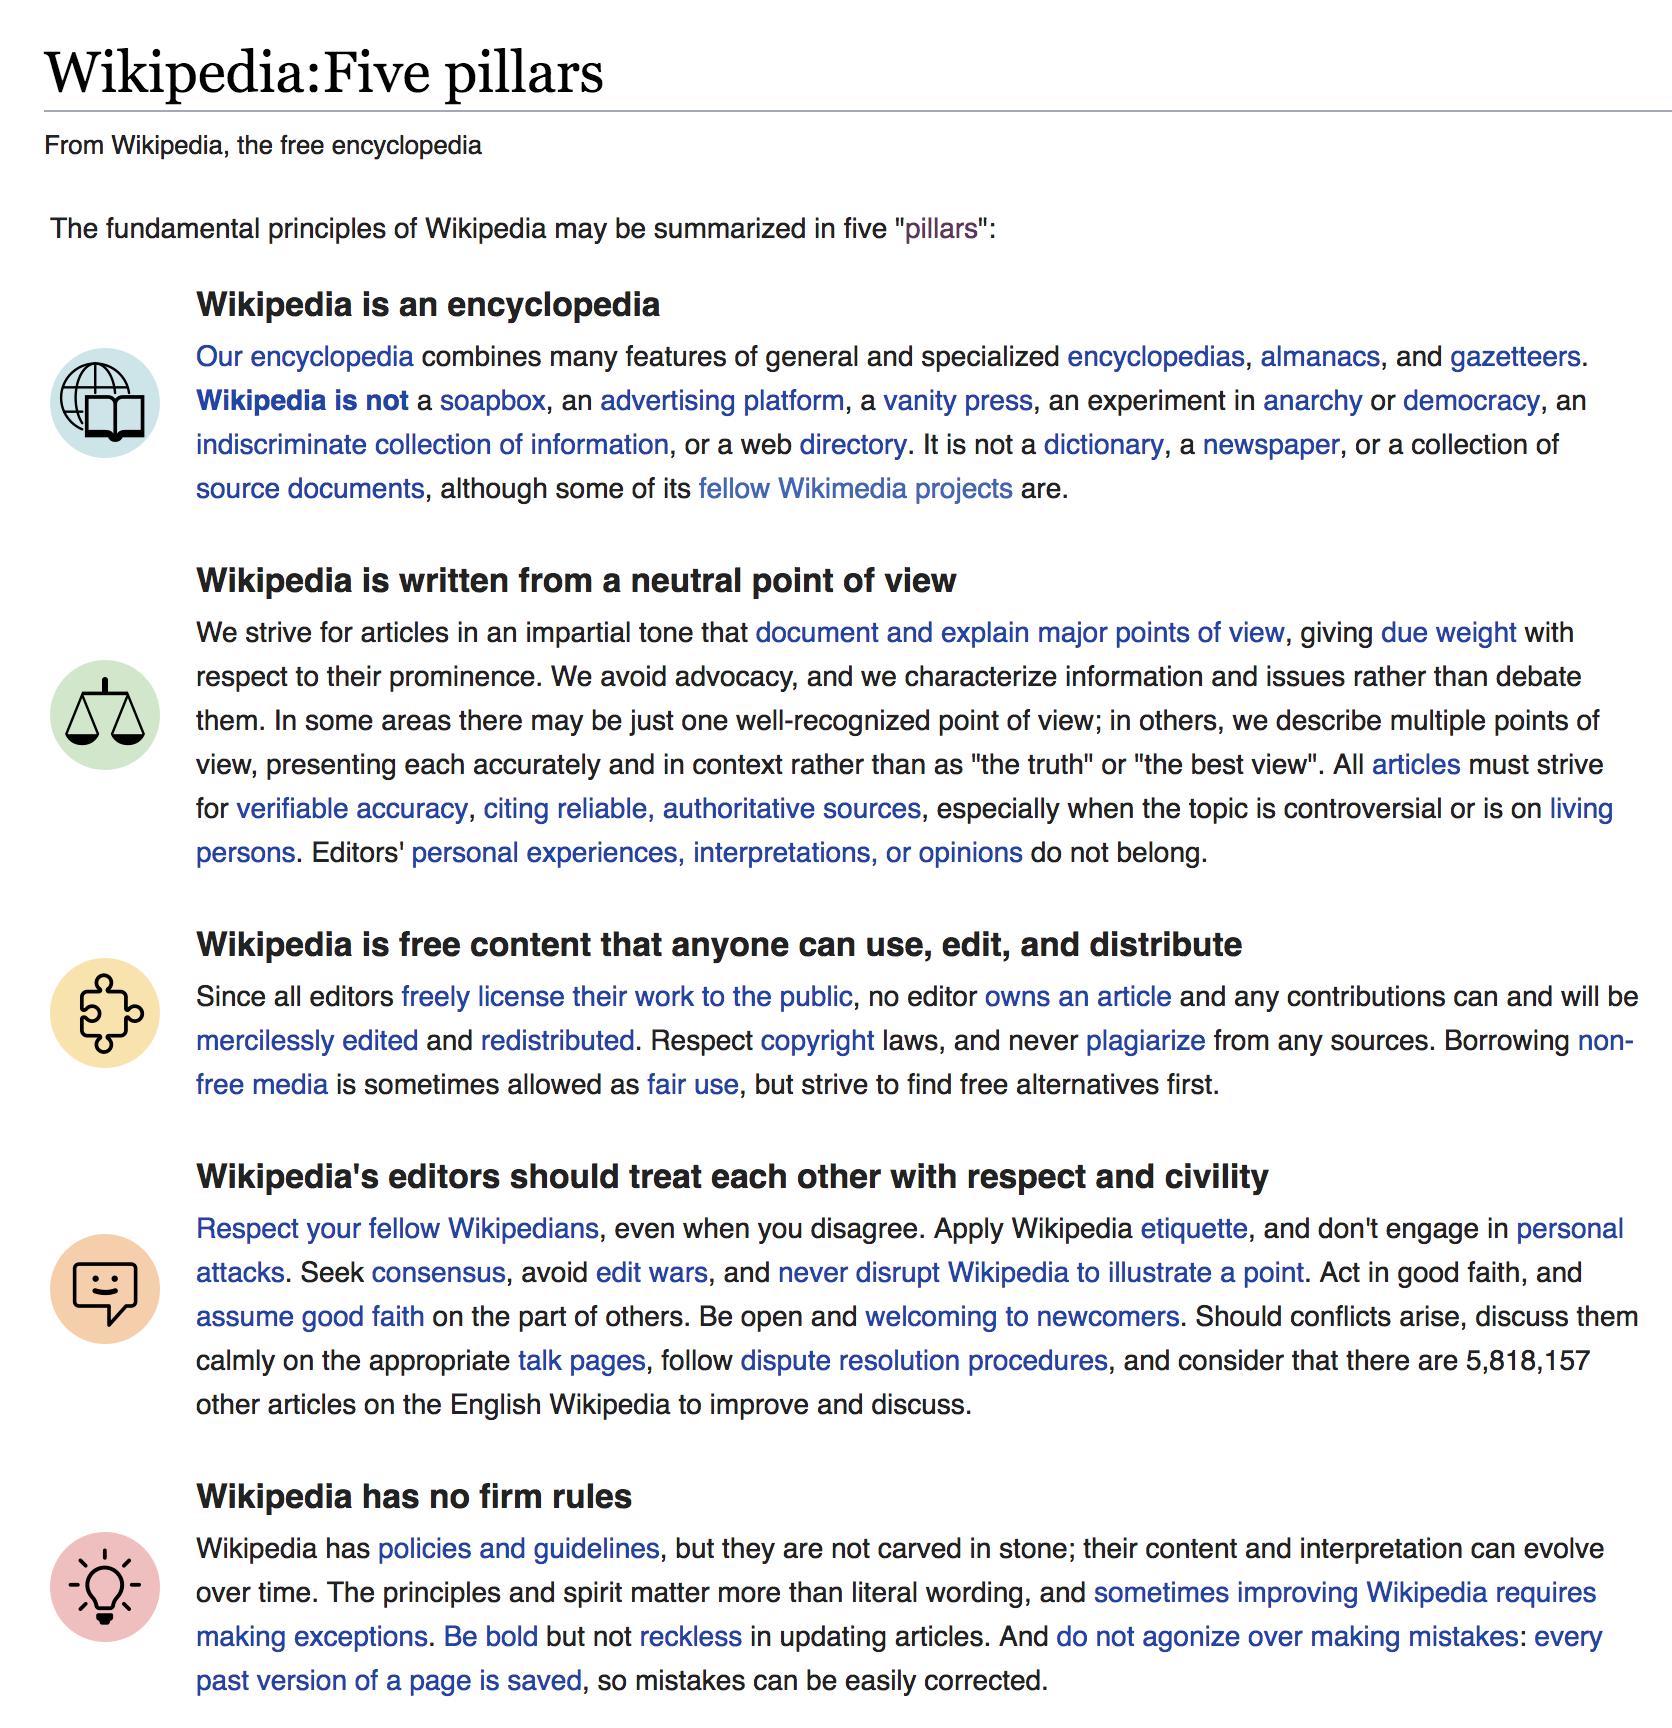 The Five Pillars of Wikipedia